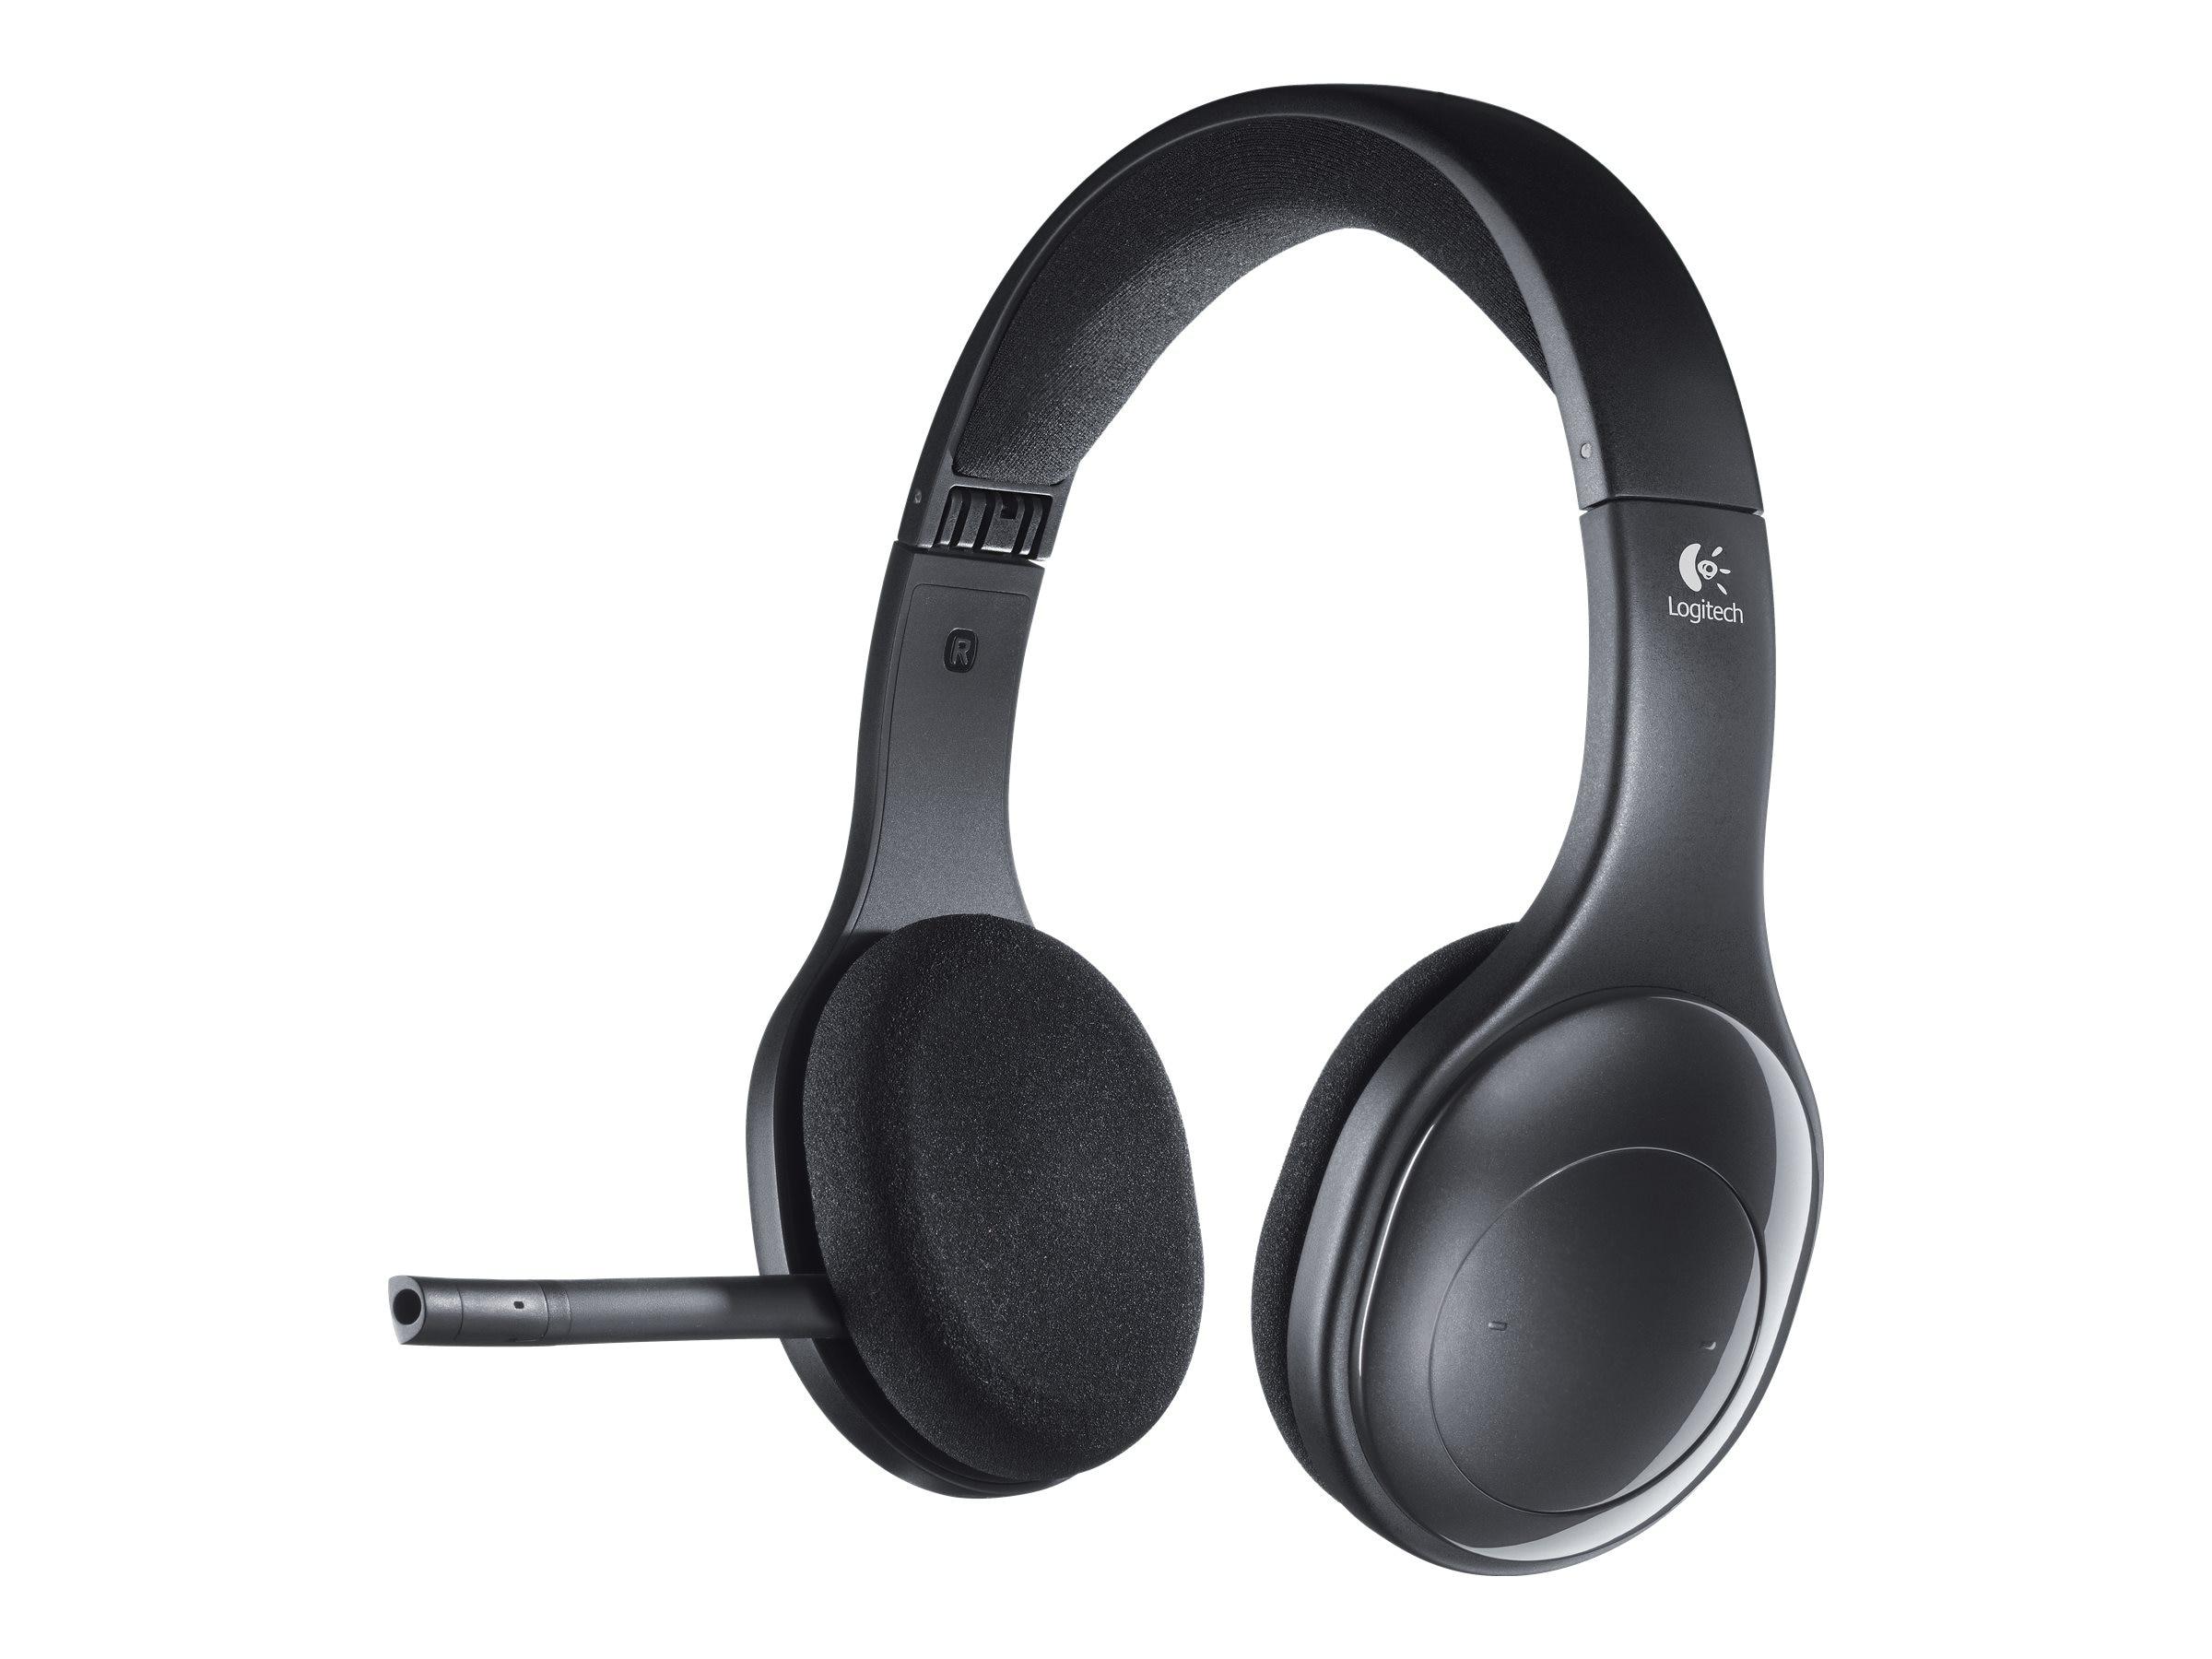 Connect Logitech Wireless Headset - Wiring